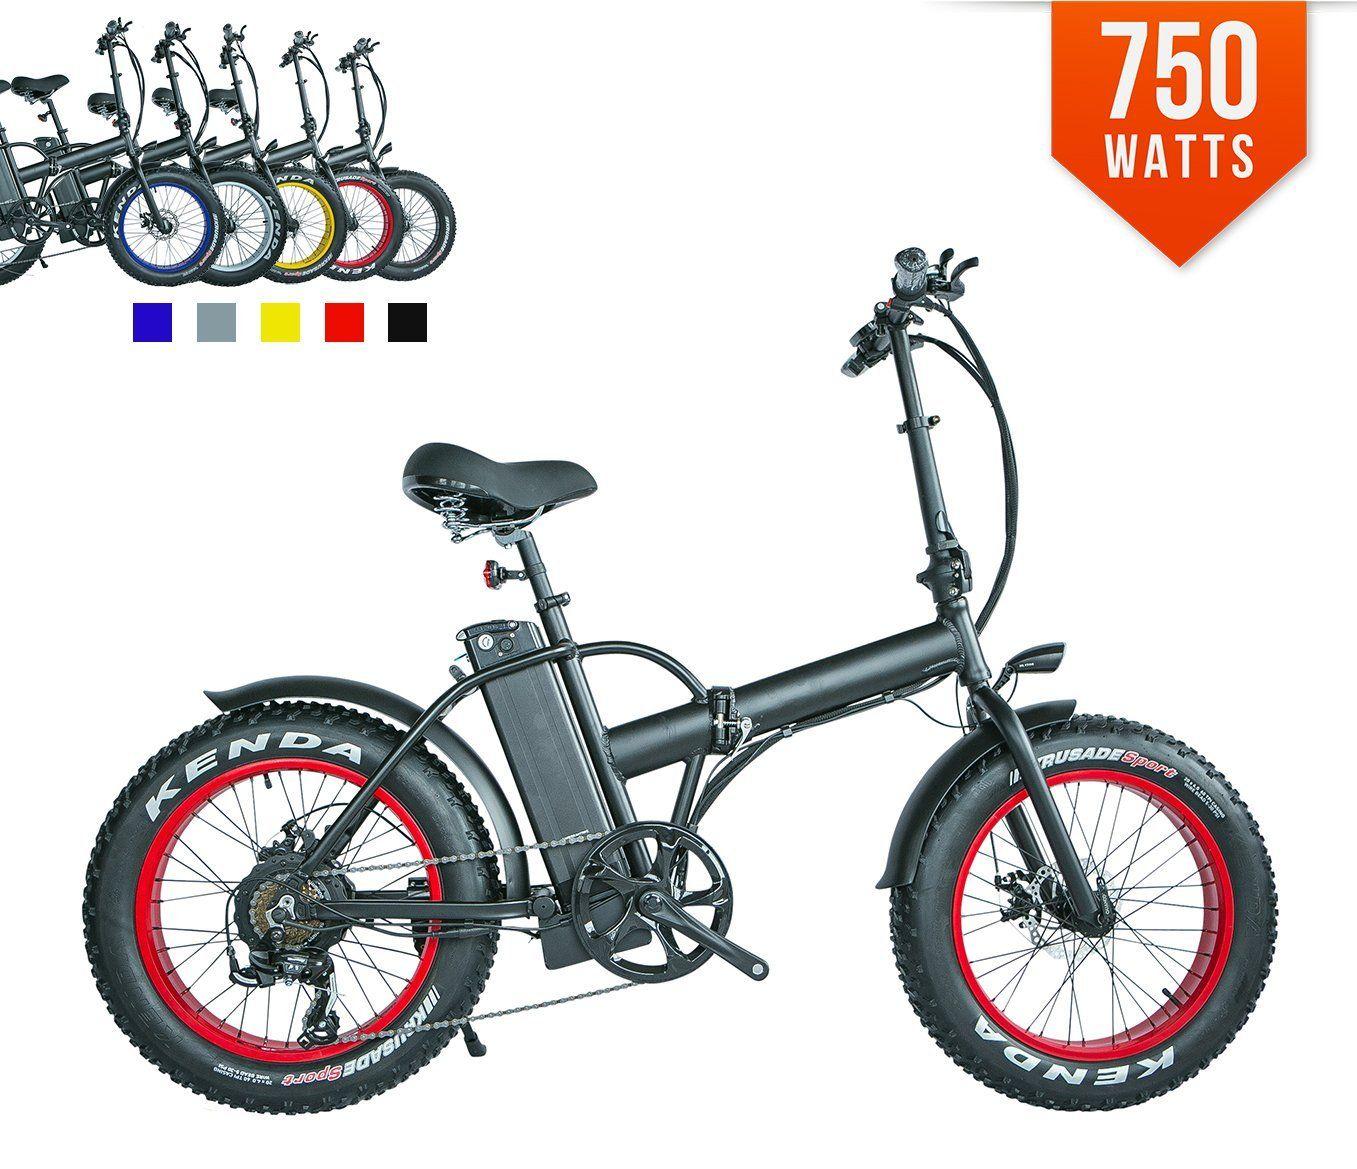 4 Top 10 Best Folding Electric Bikes Review Folding Electric Bike Electric Bike Review Bike Reviews